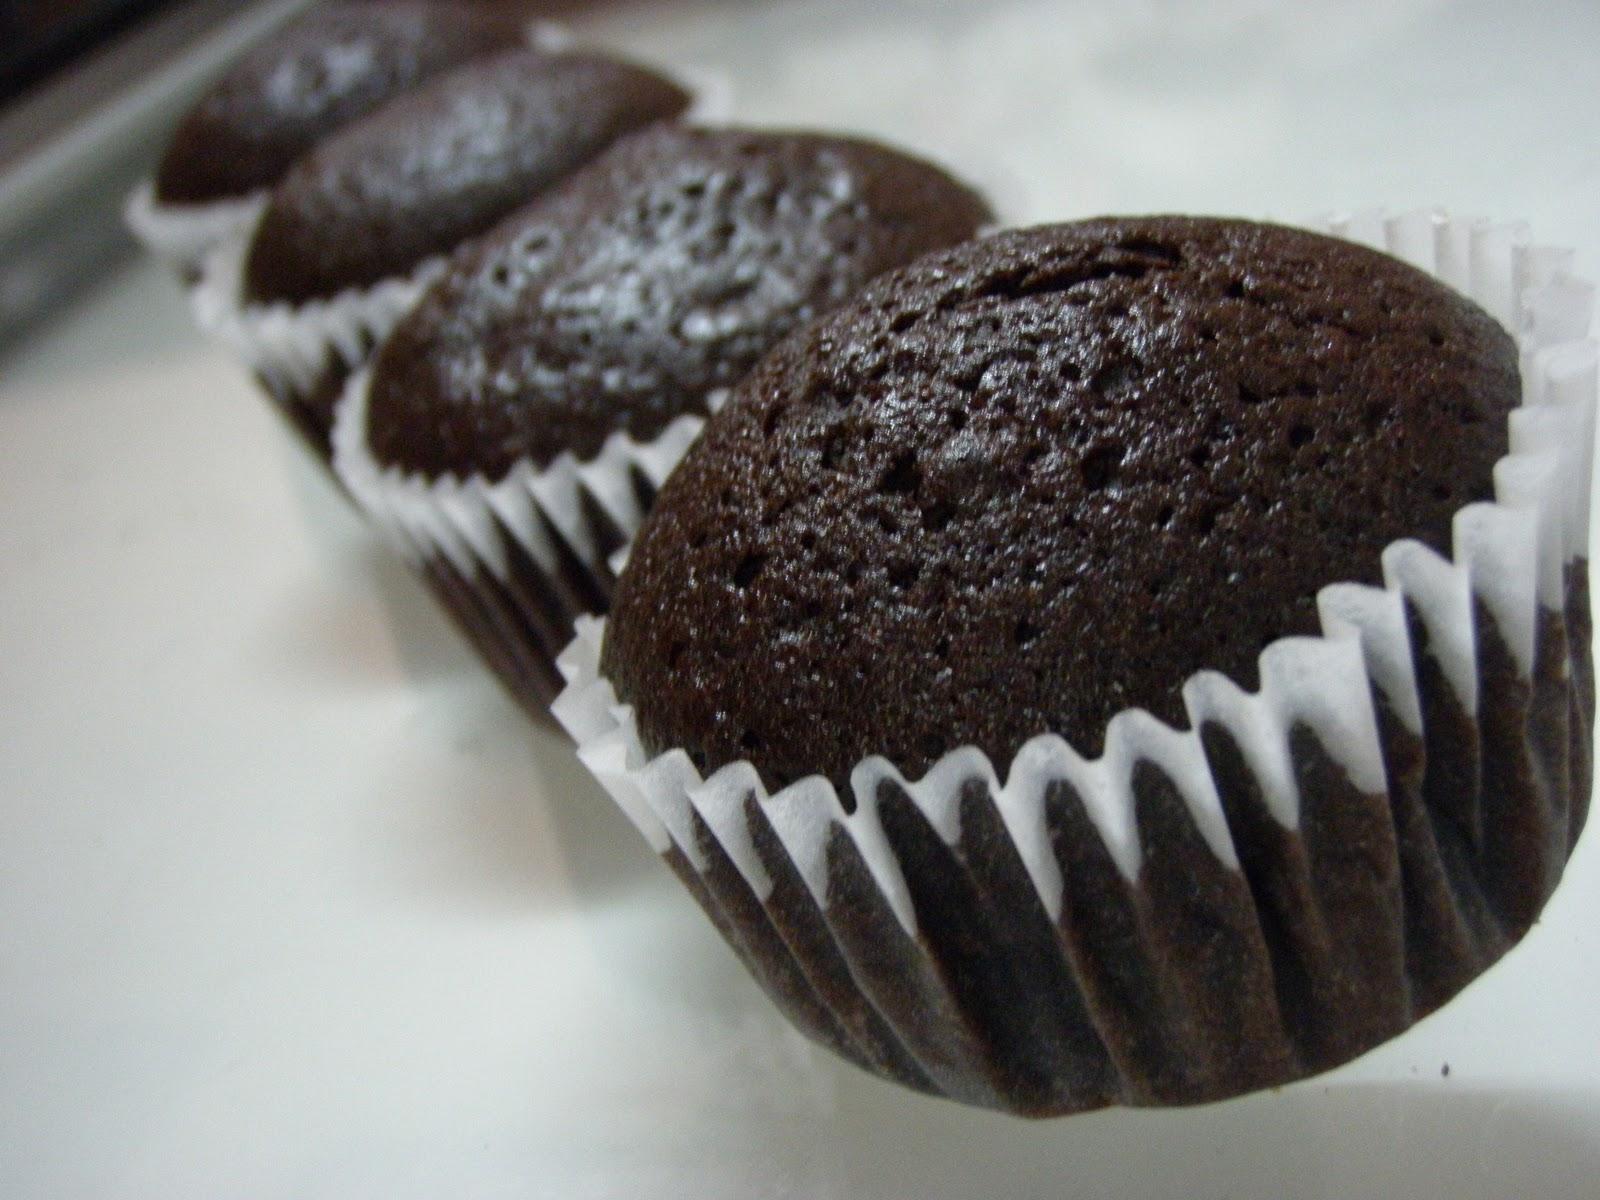 Welcome 2 Harga Muffin